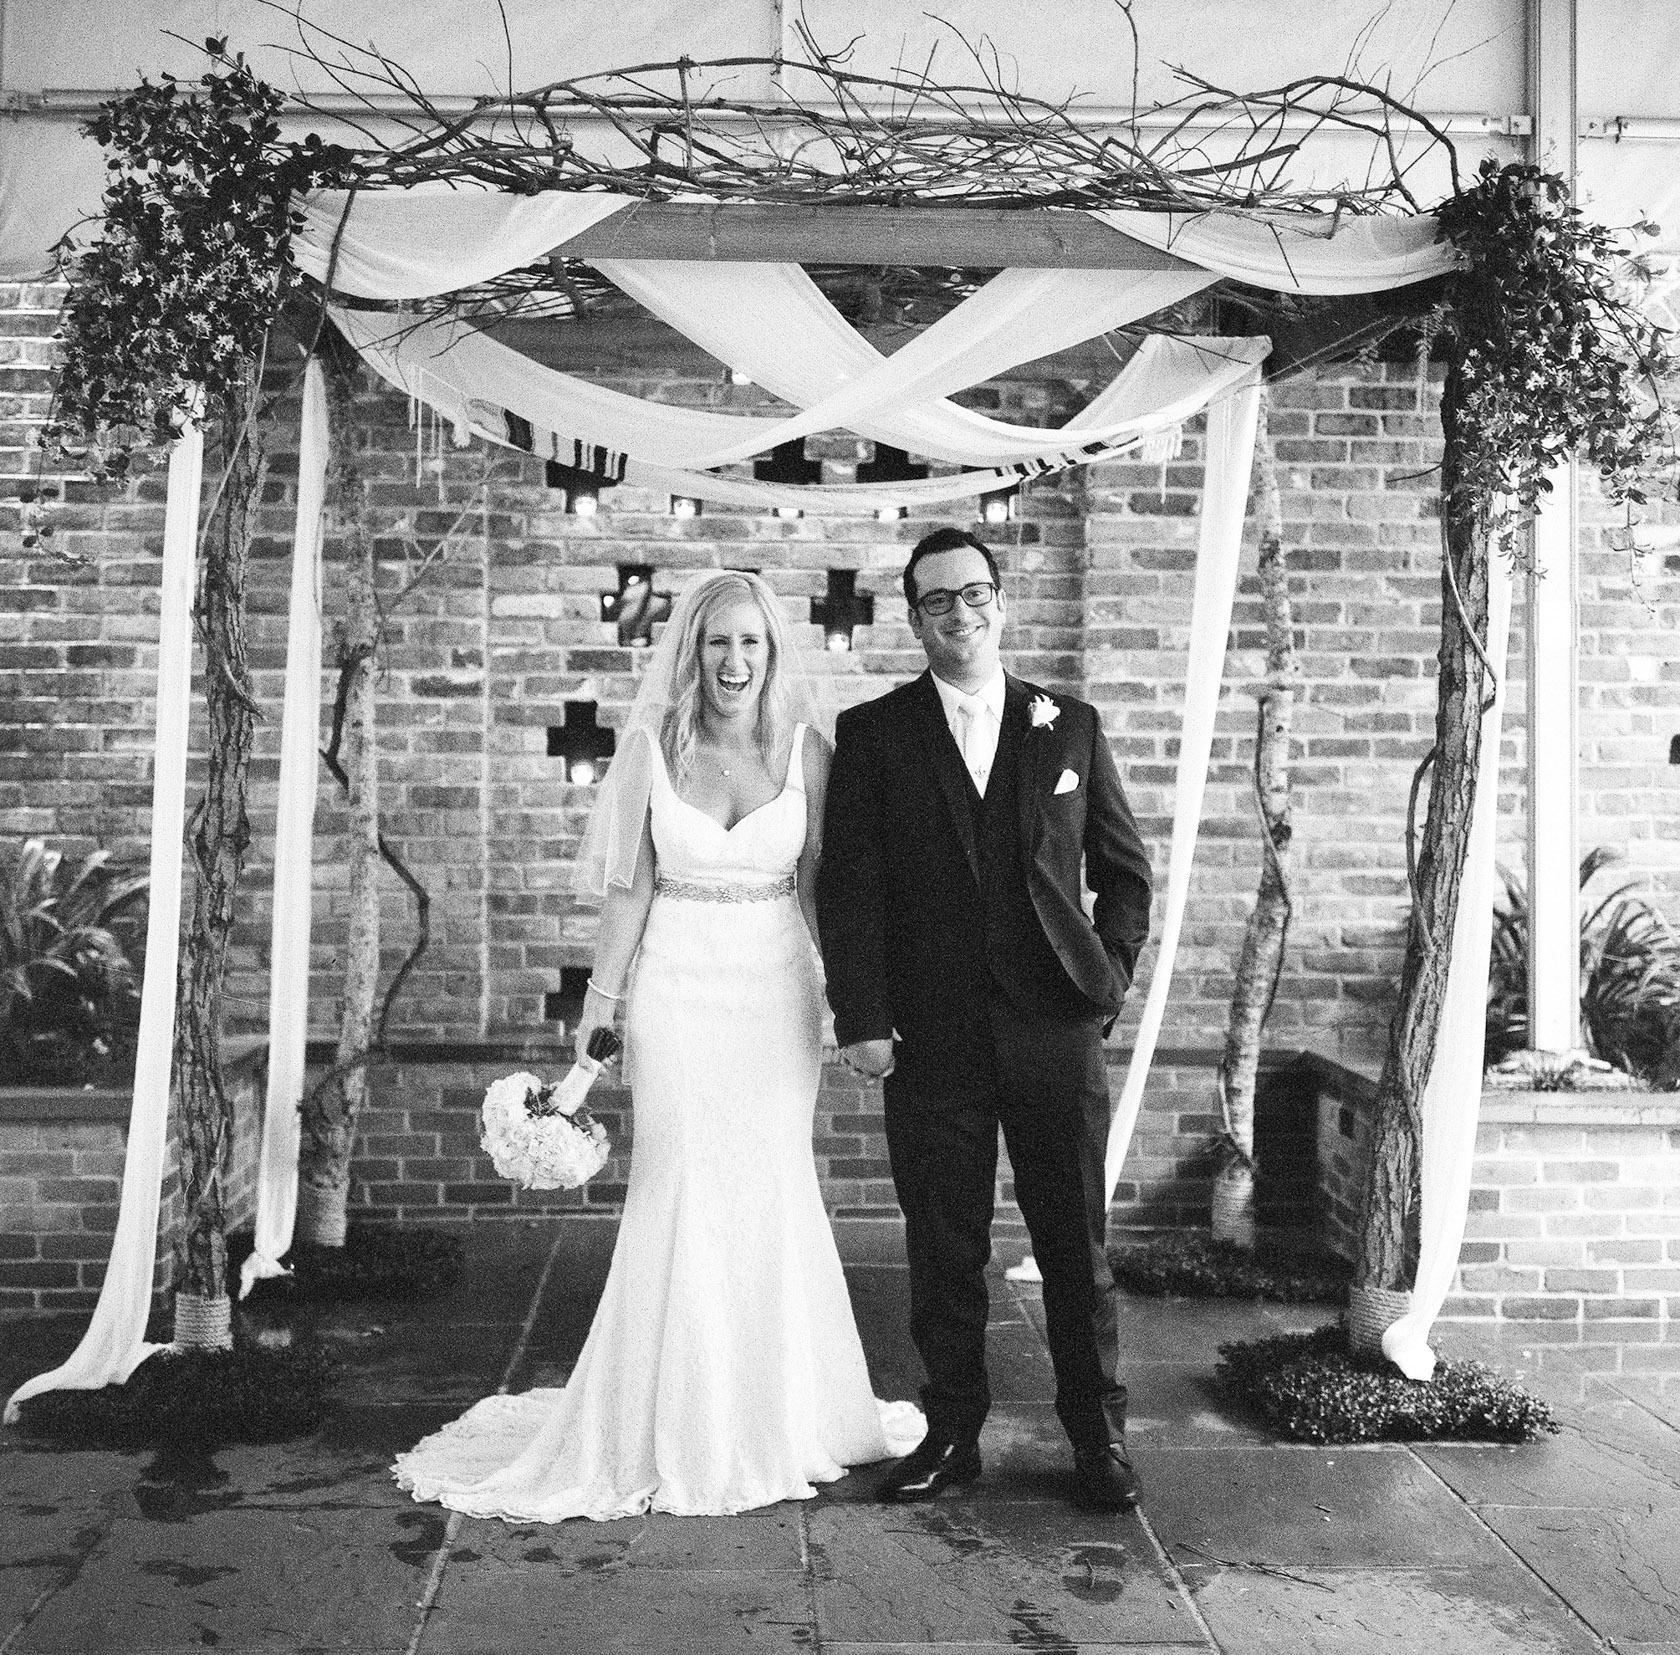 maison dupuy wedding on film 06